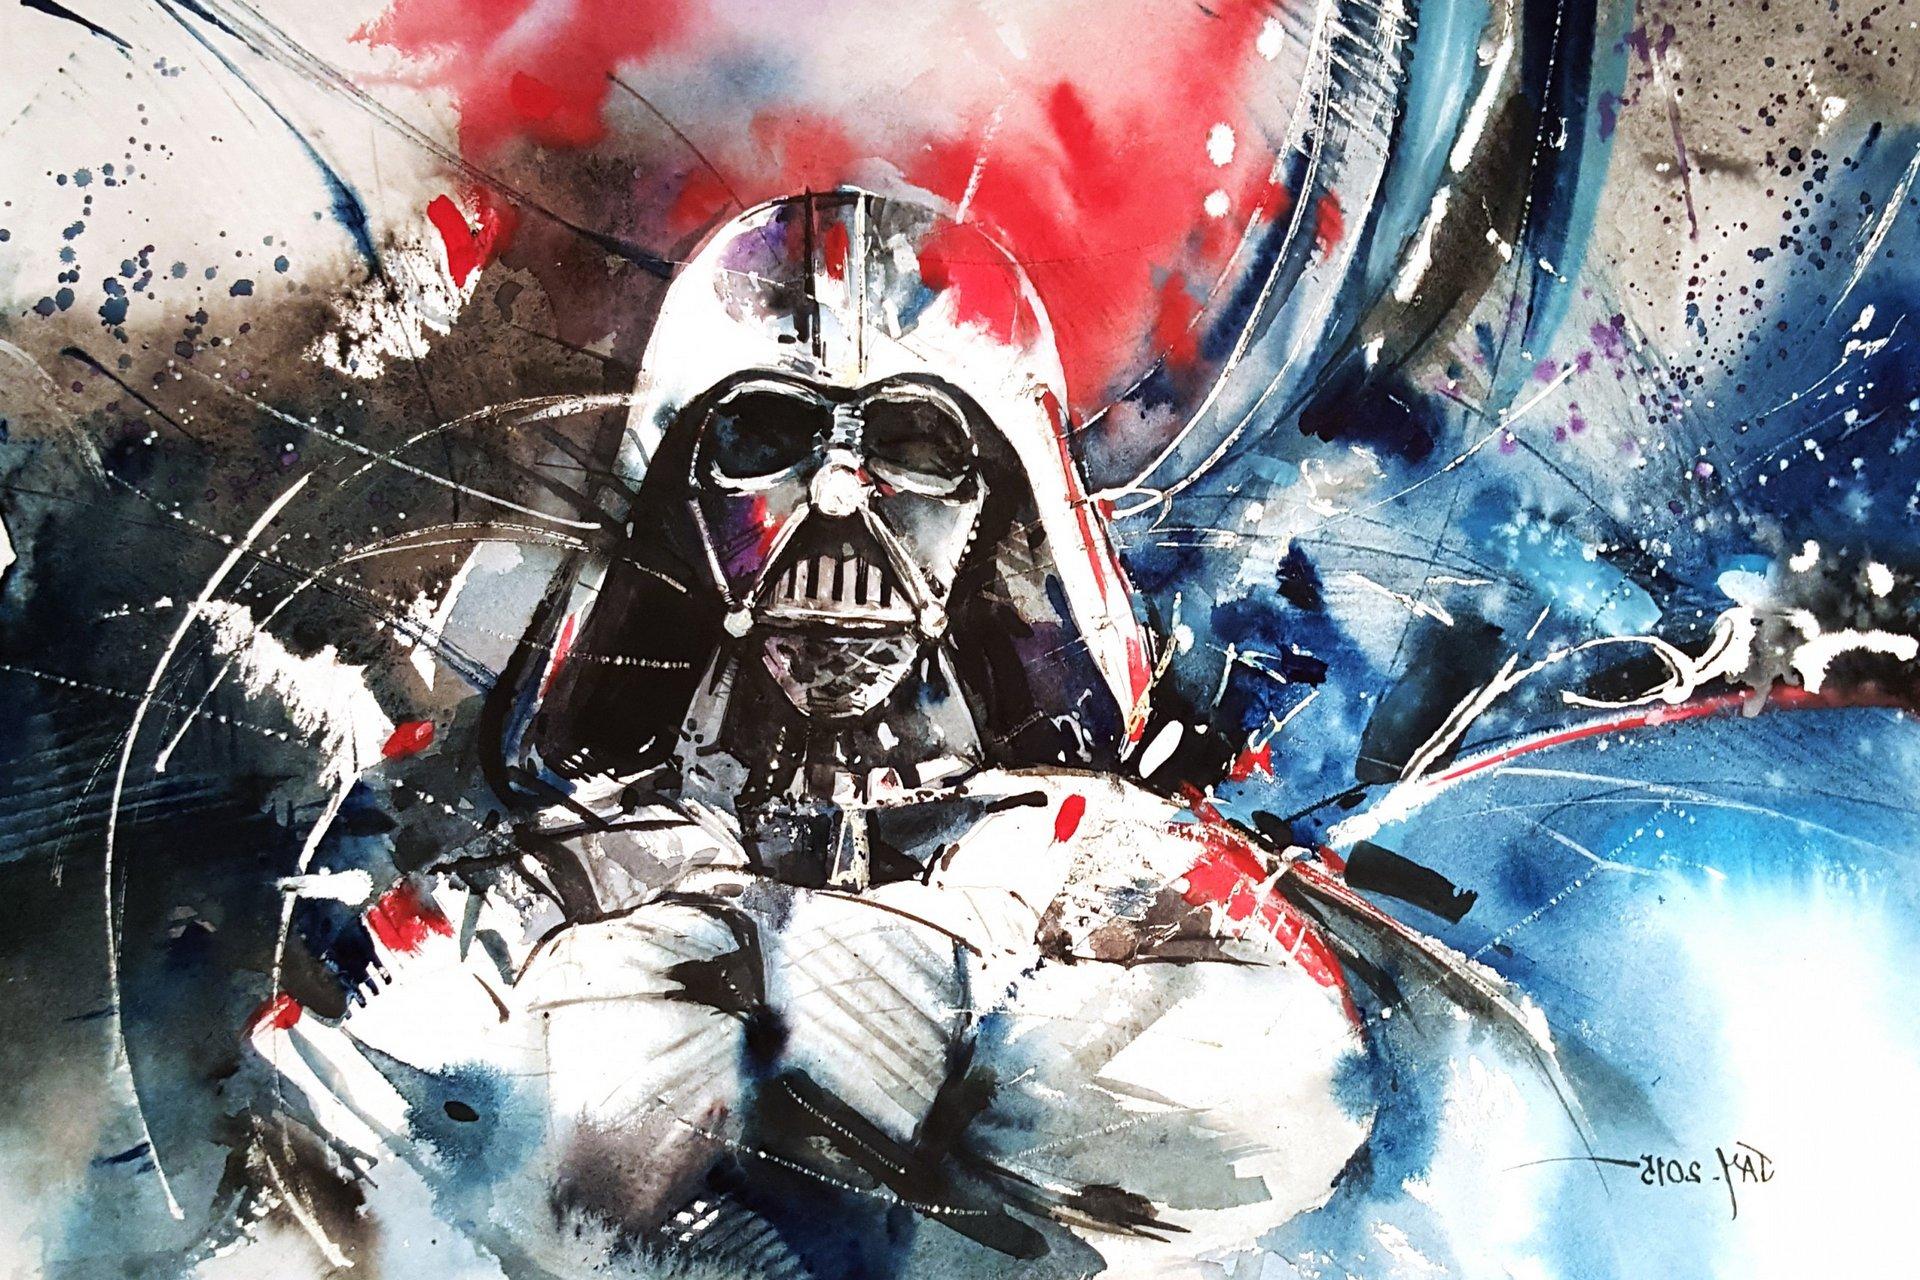 star wars wallpaper full hd 1331 wallpaper